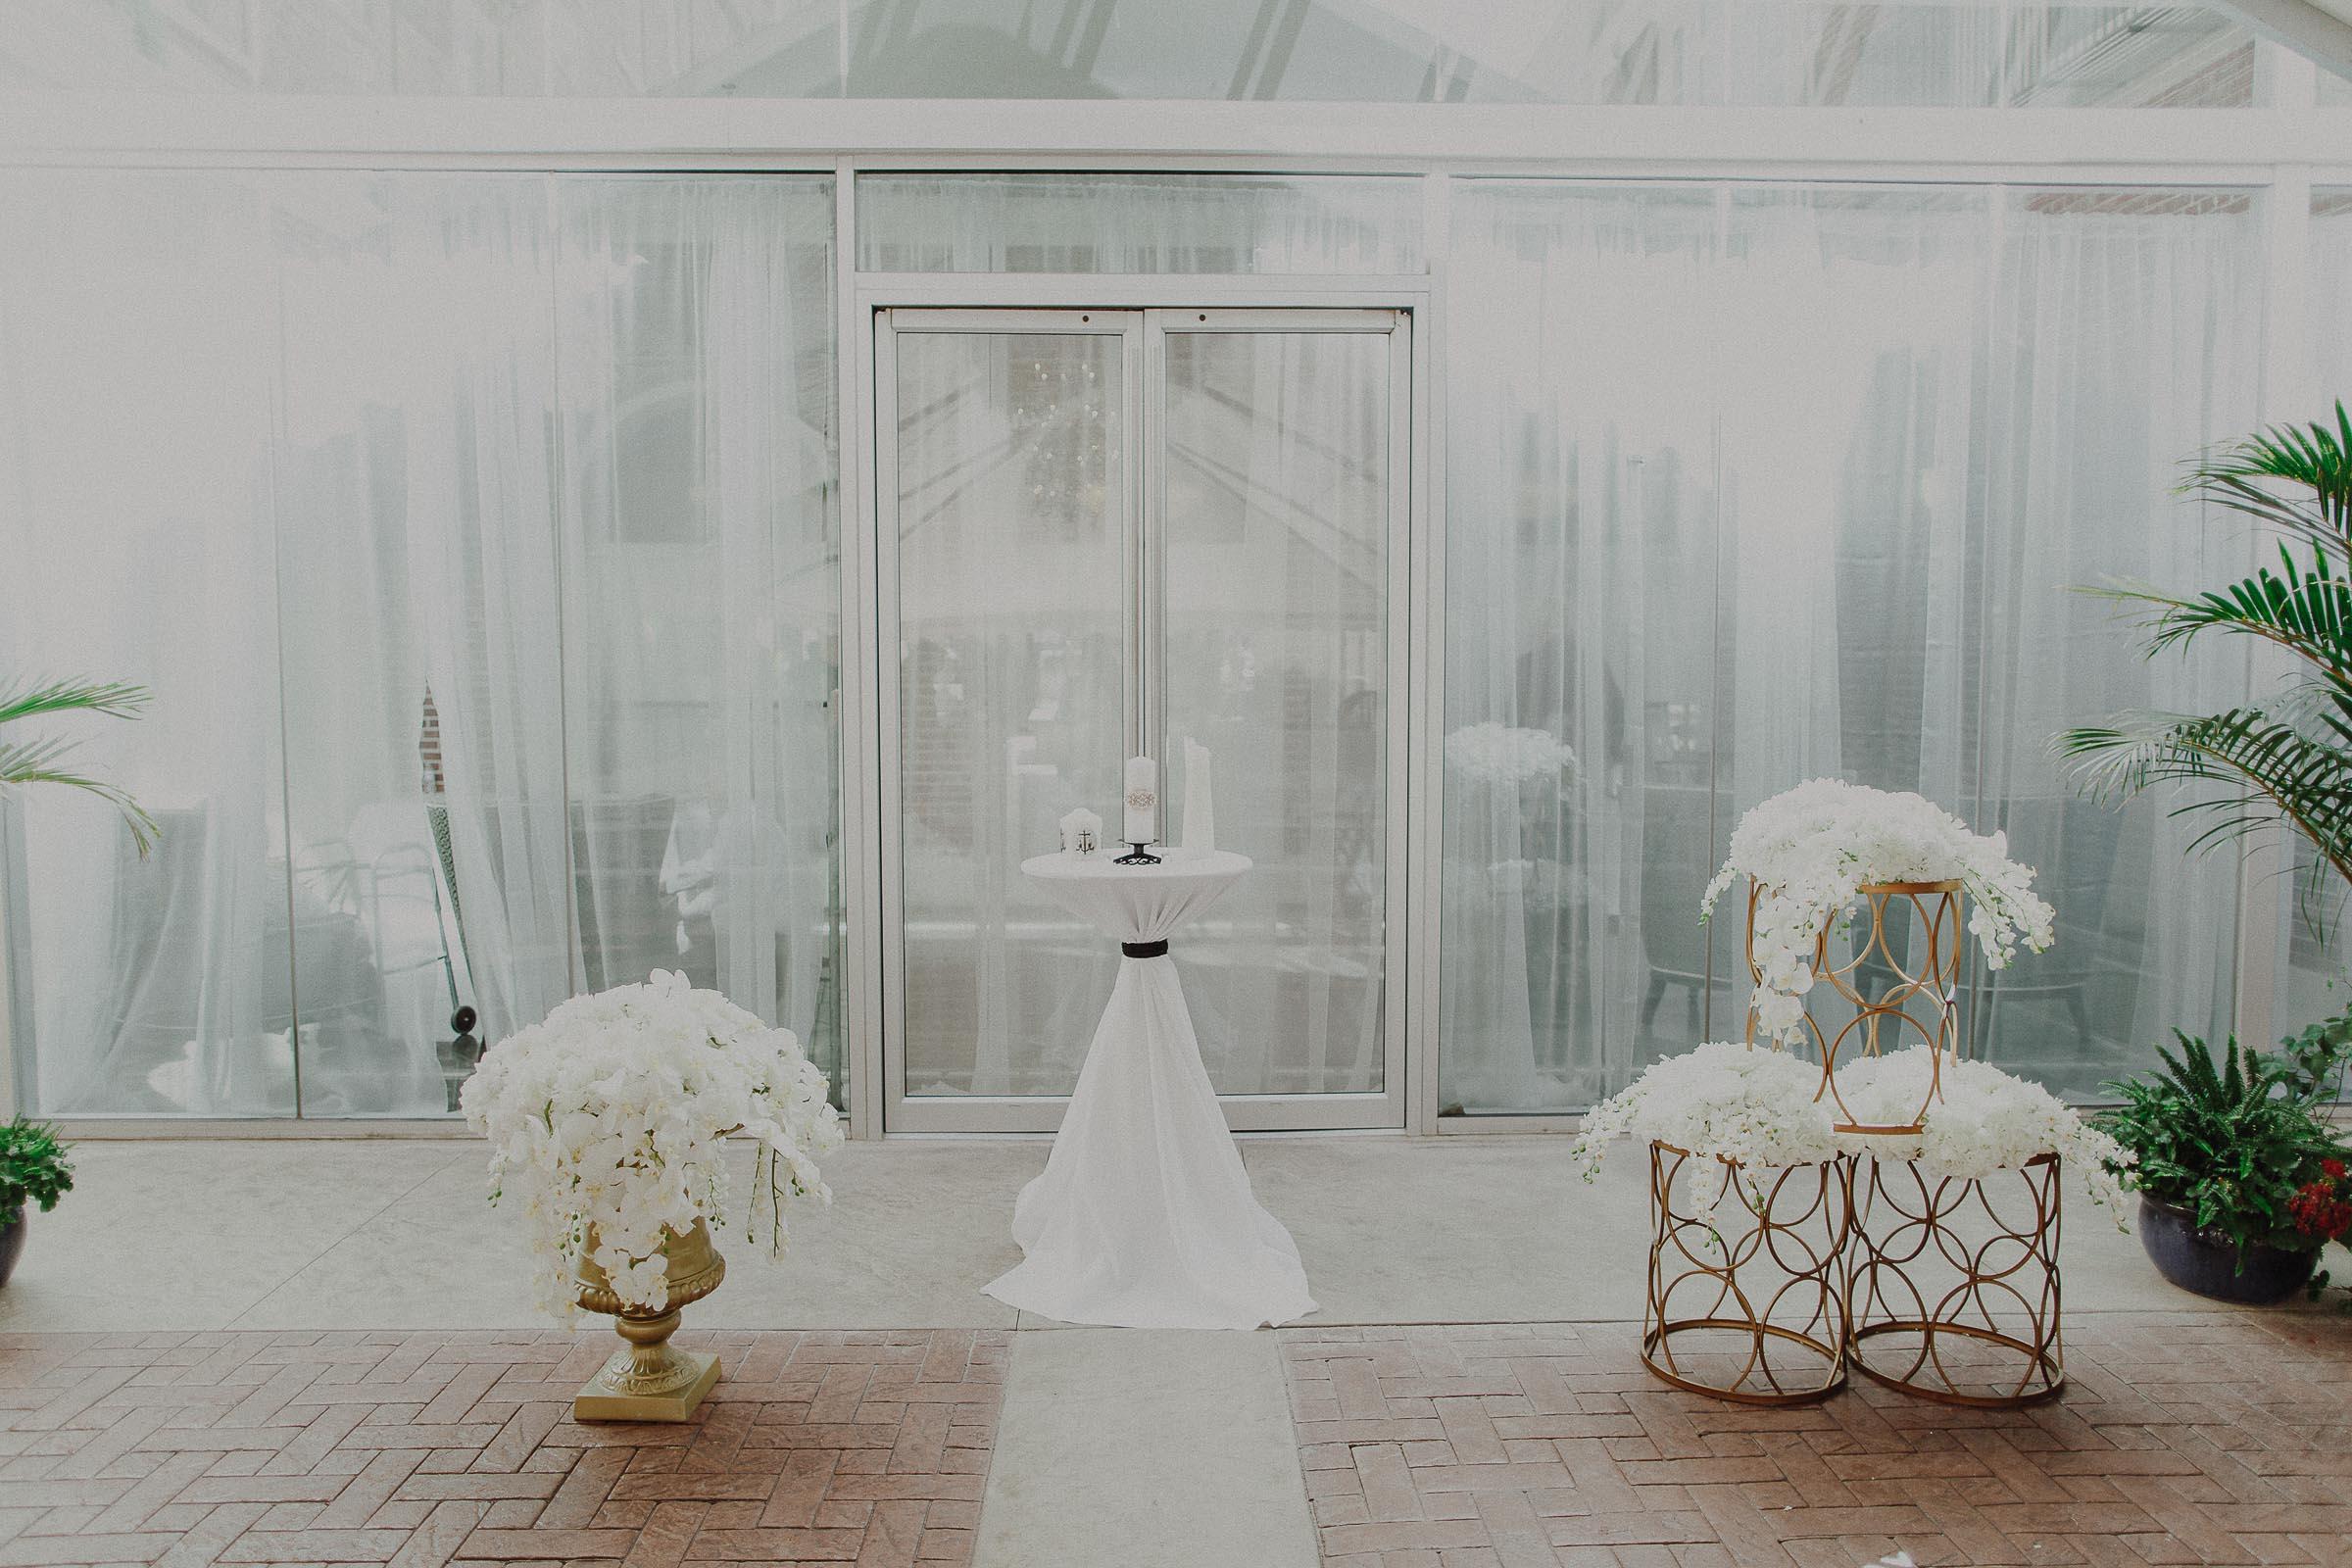 epic flower piece for wedding ceremony